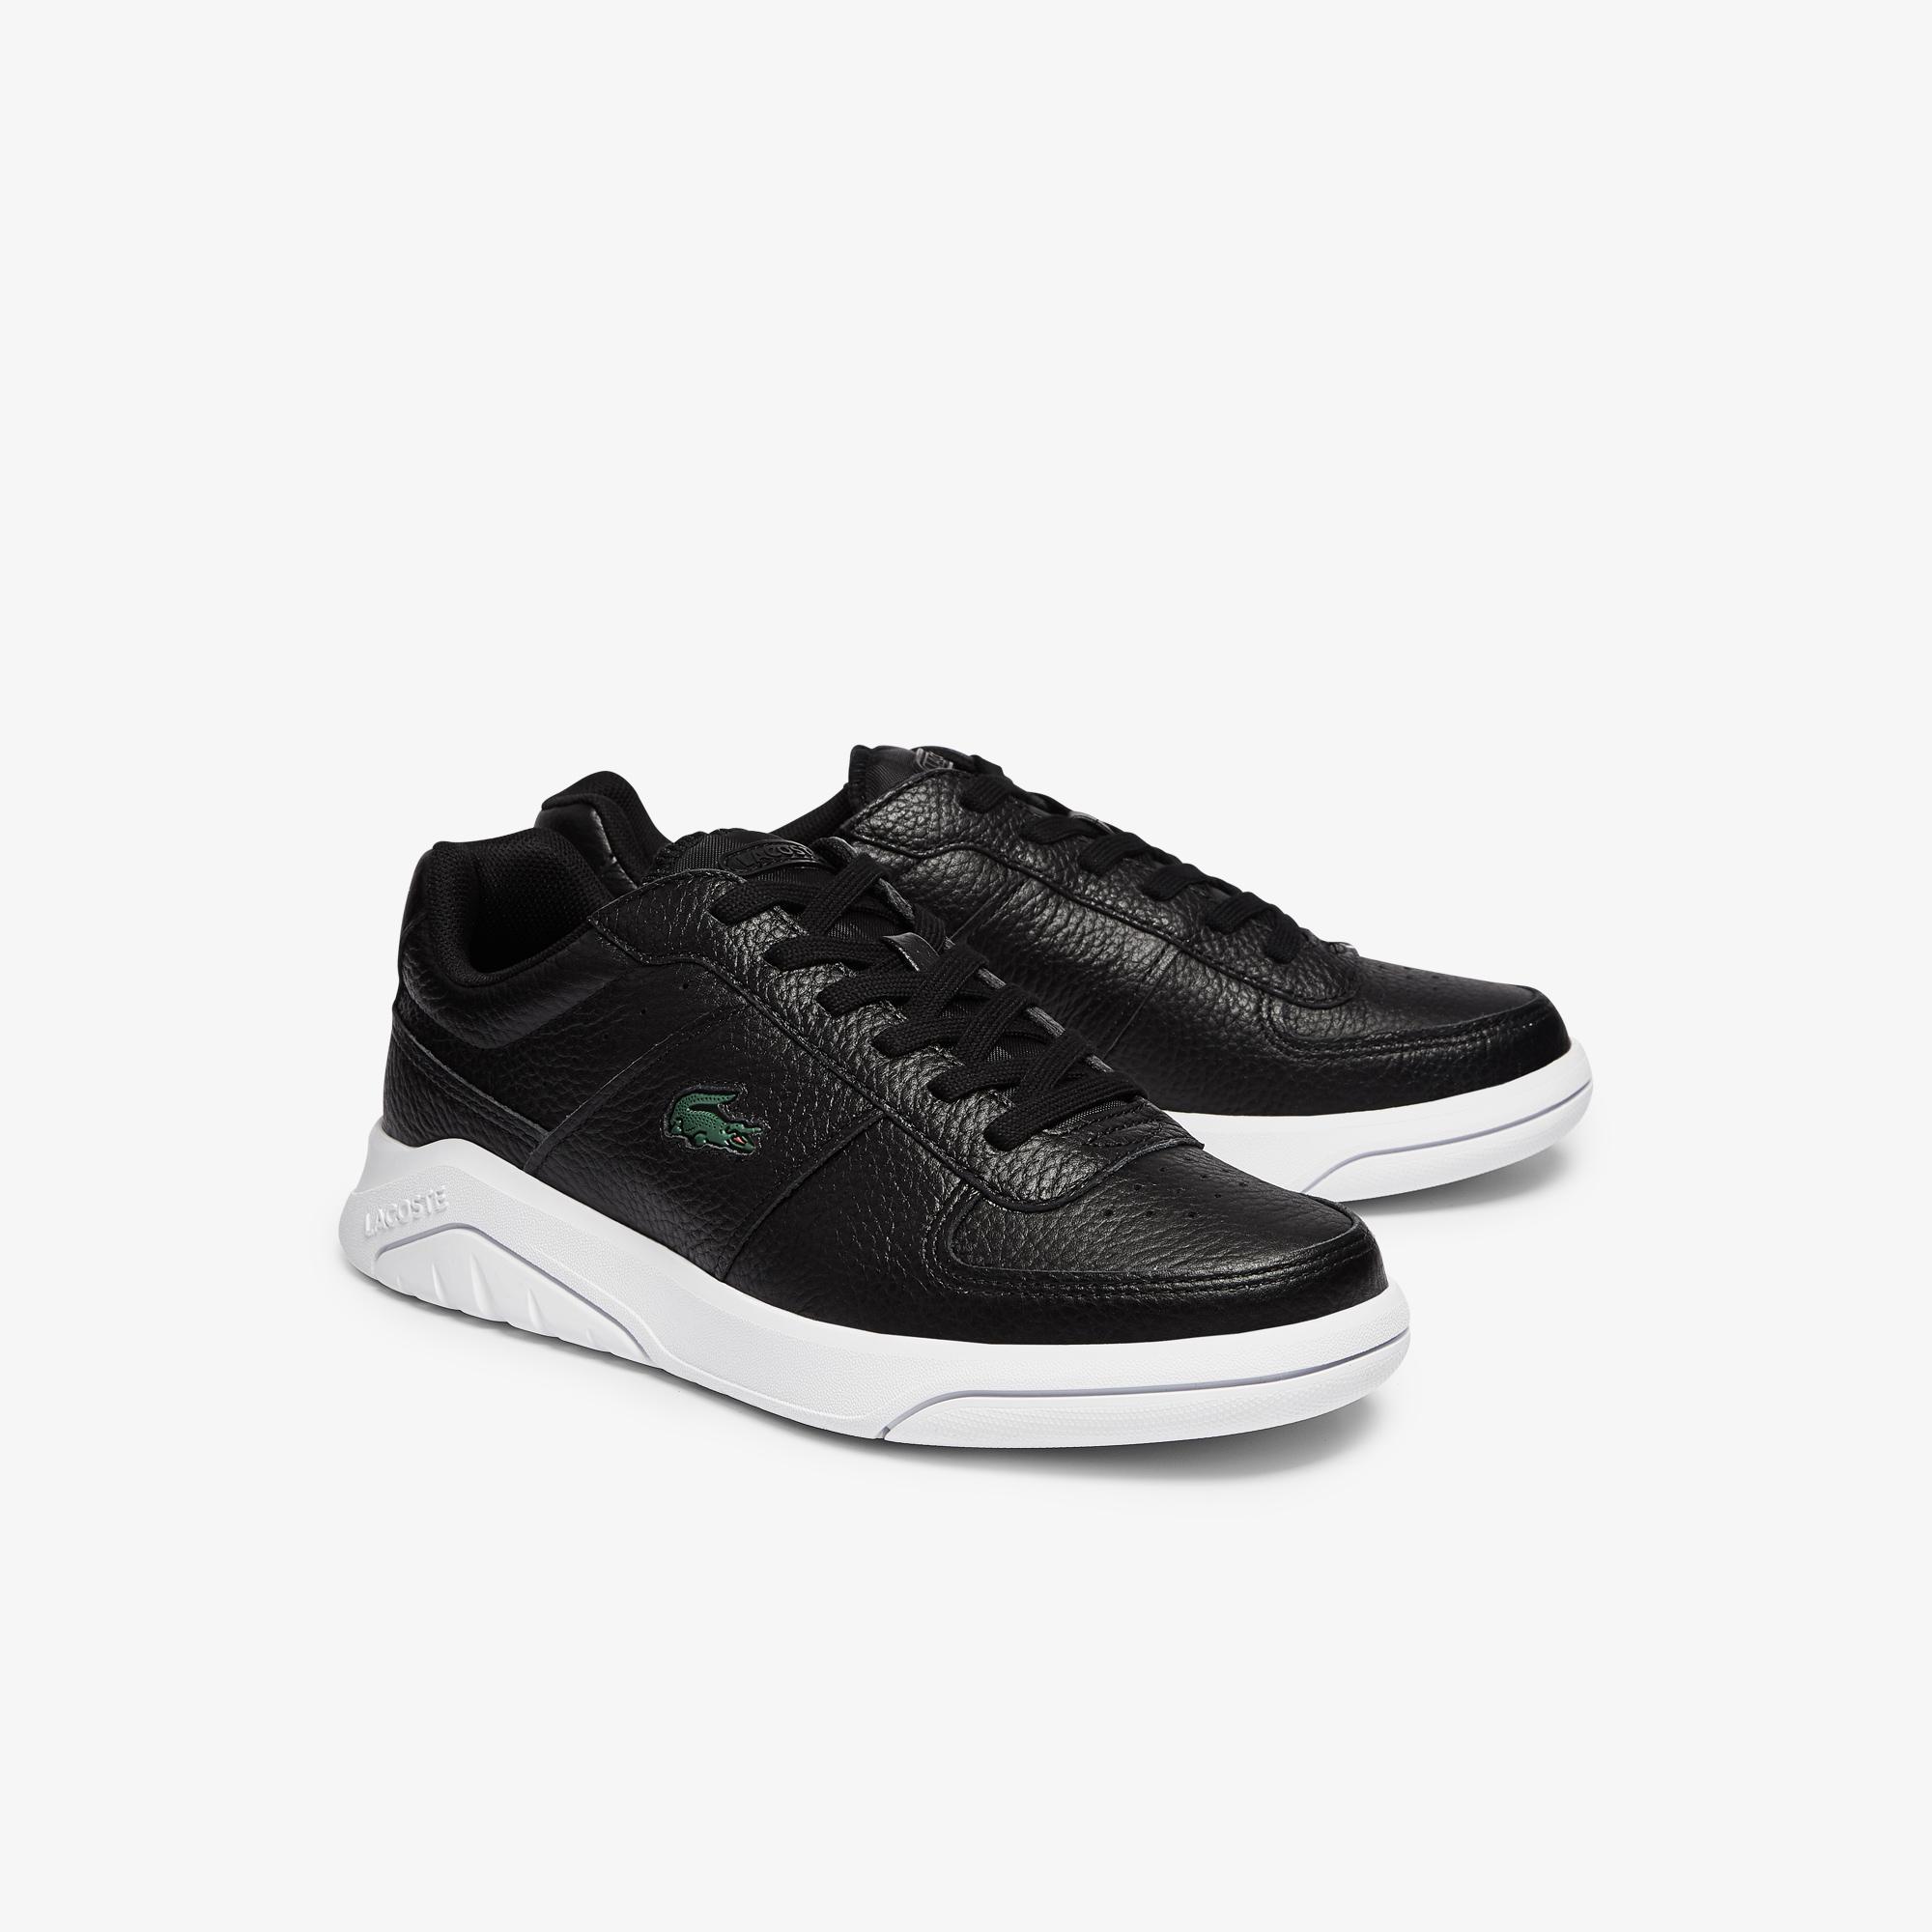 Lacoste Game Advance 0721 4 Sma Erkek Siyah - Beyaz Sneaker